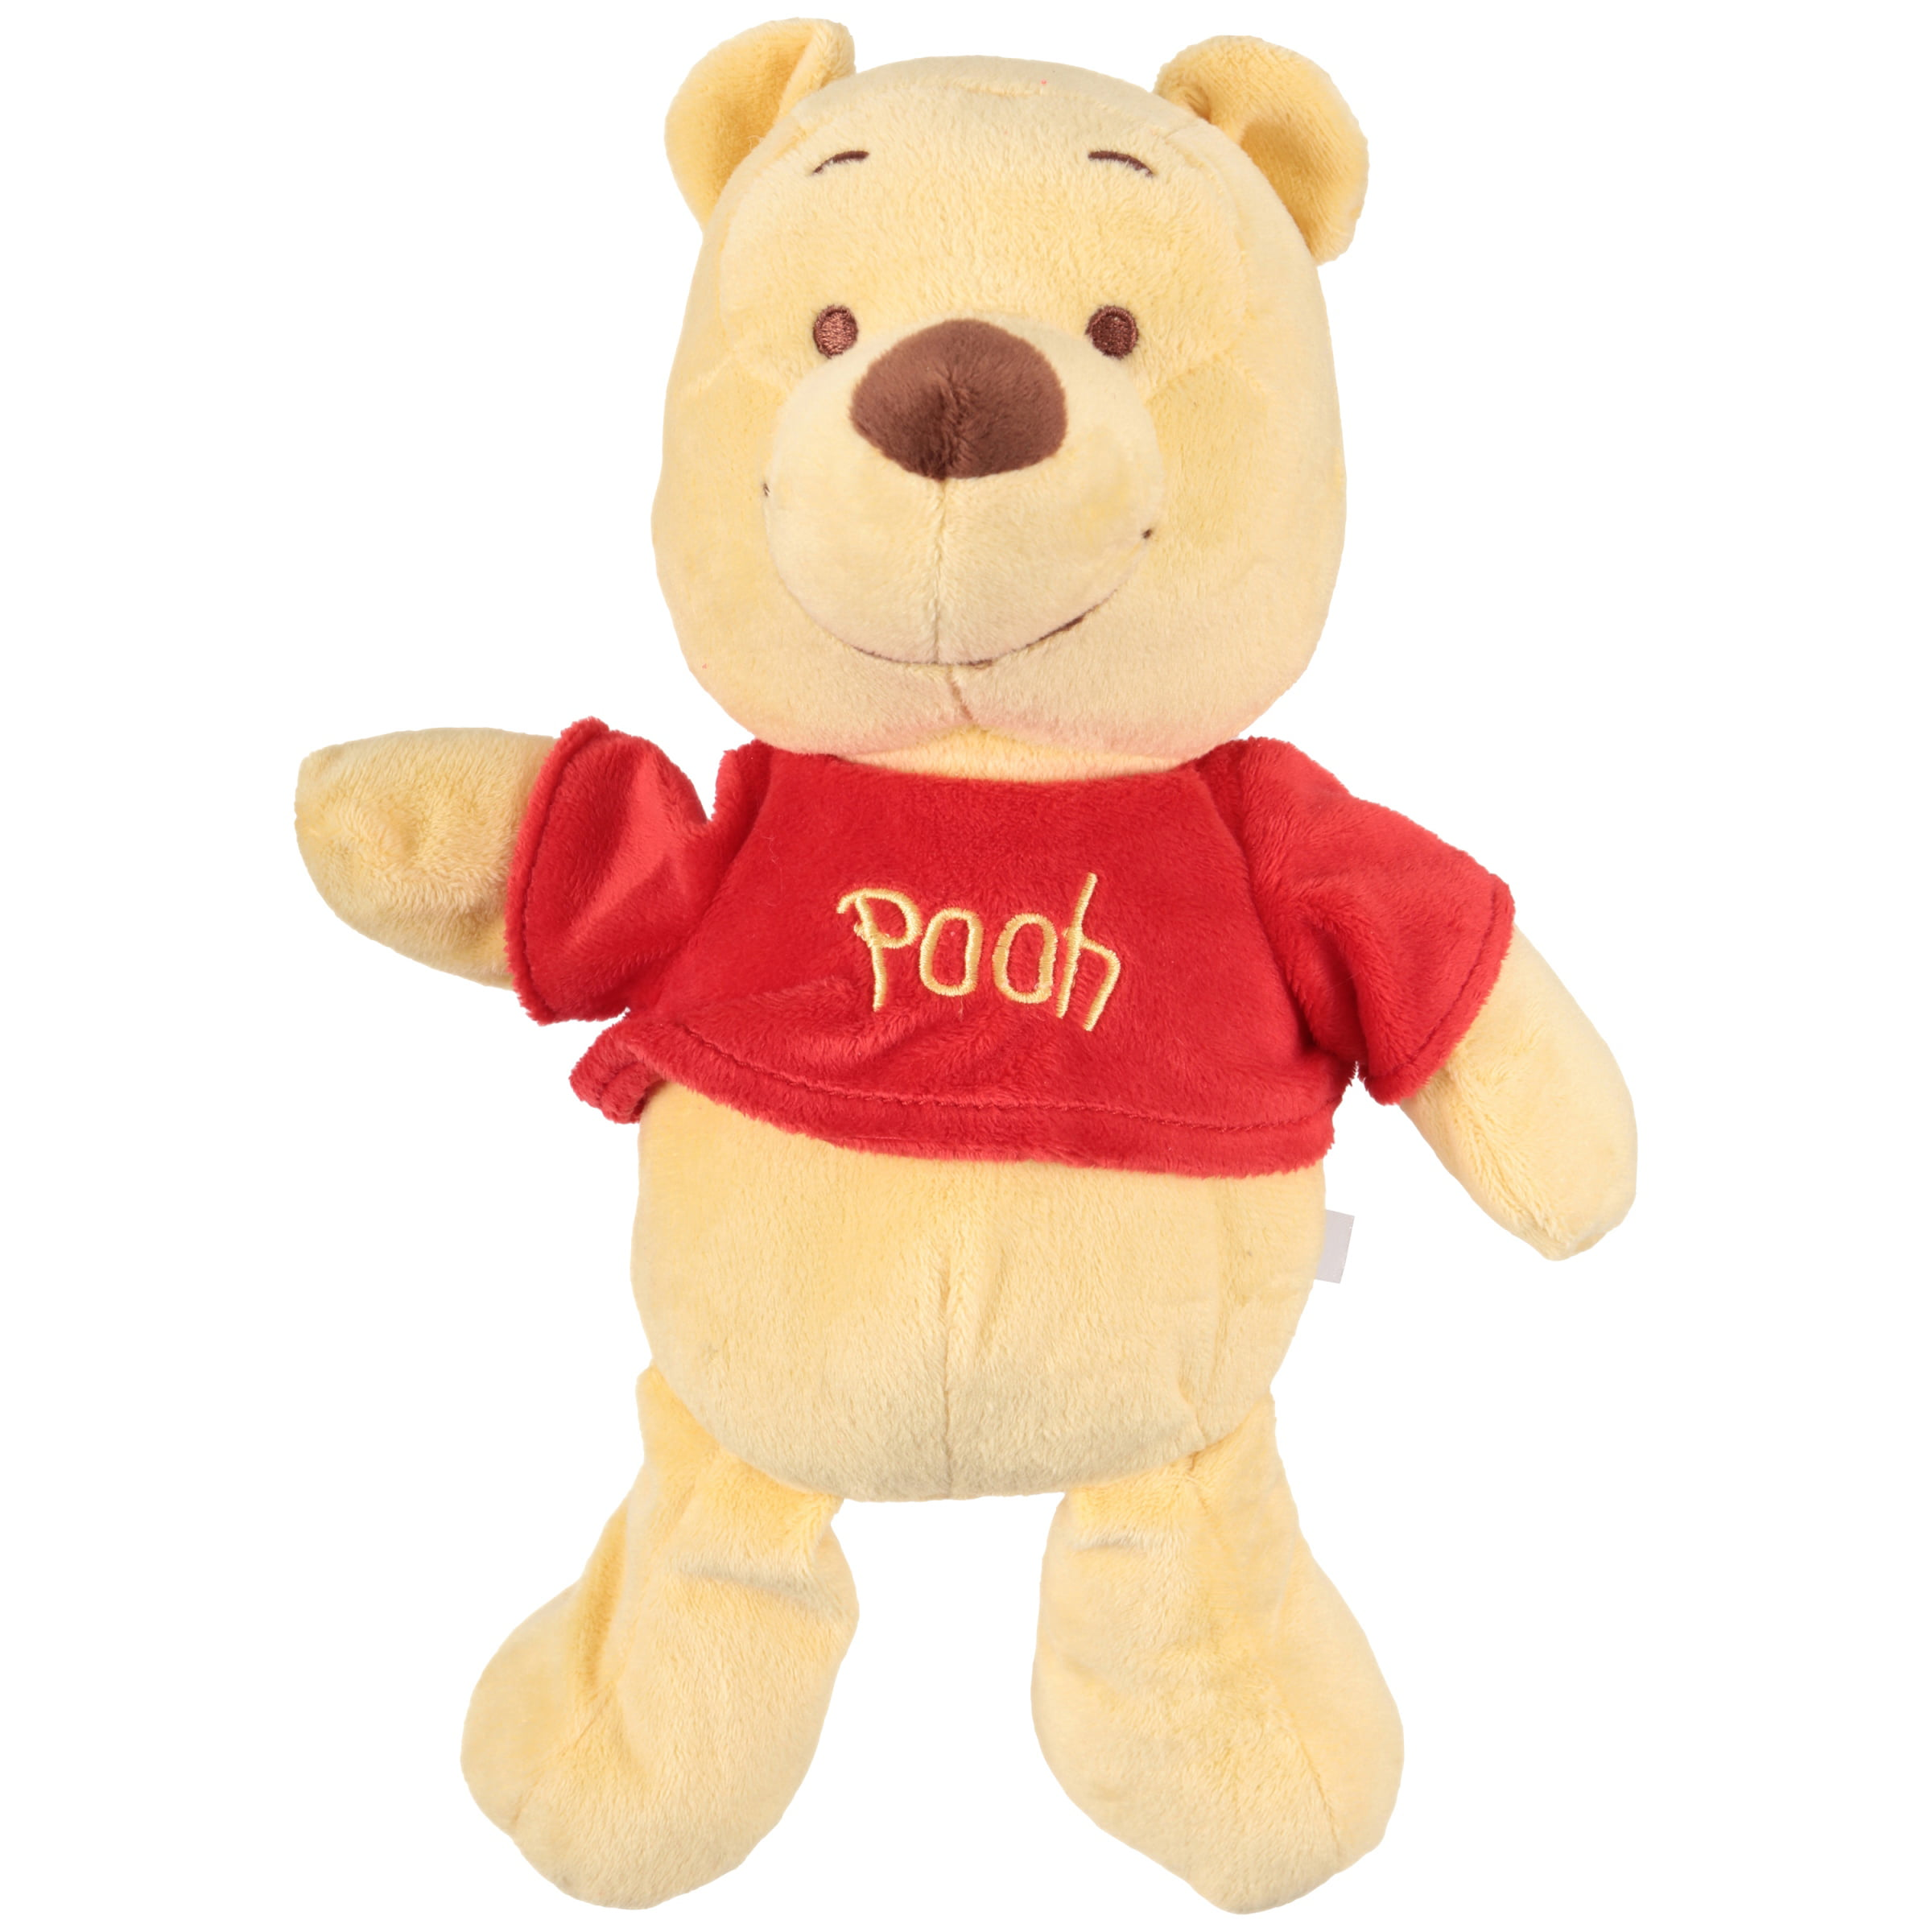 Disney Baby Winnie The Pooh Teddy Bear Plush Walmart Com